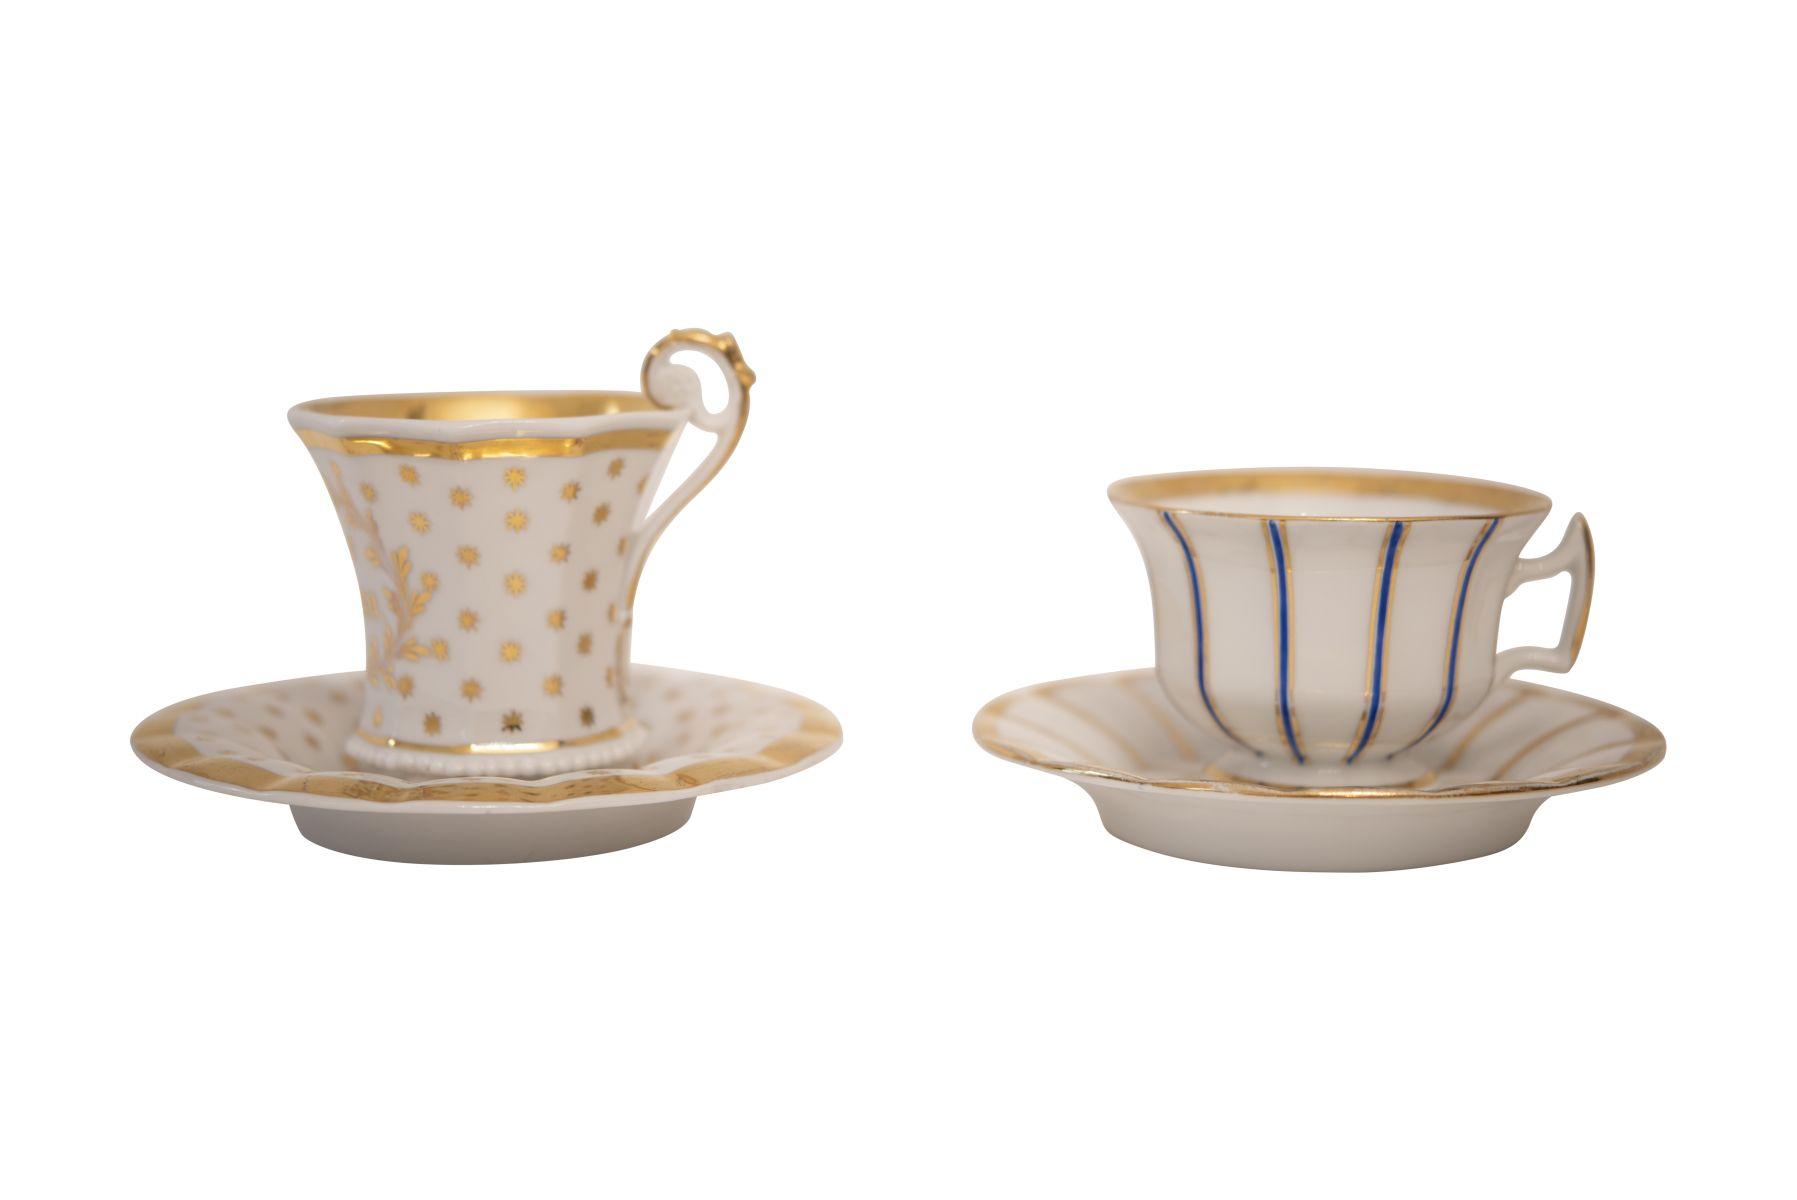 #170 Porcelain collection cups | Sammeltassen, Porzellan Image